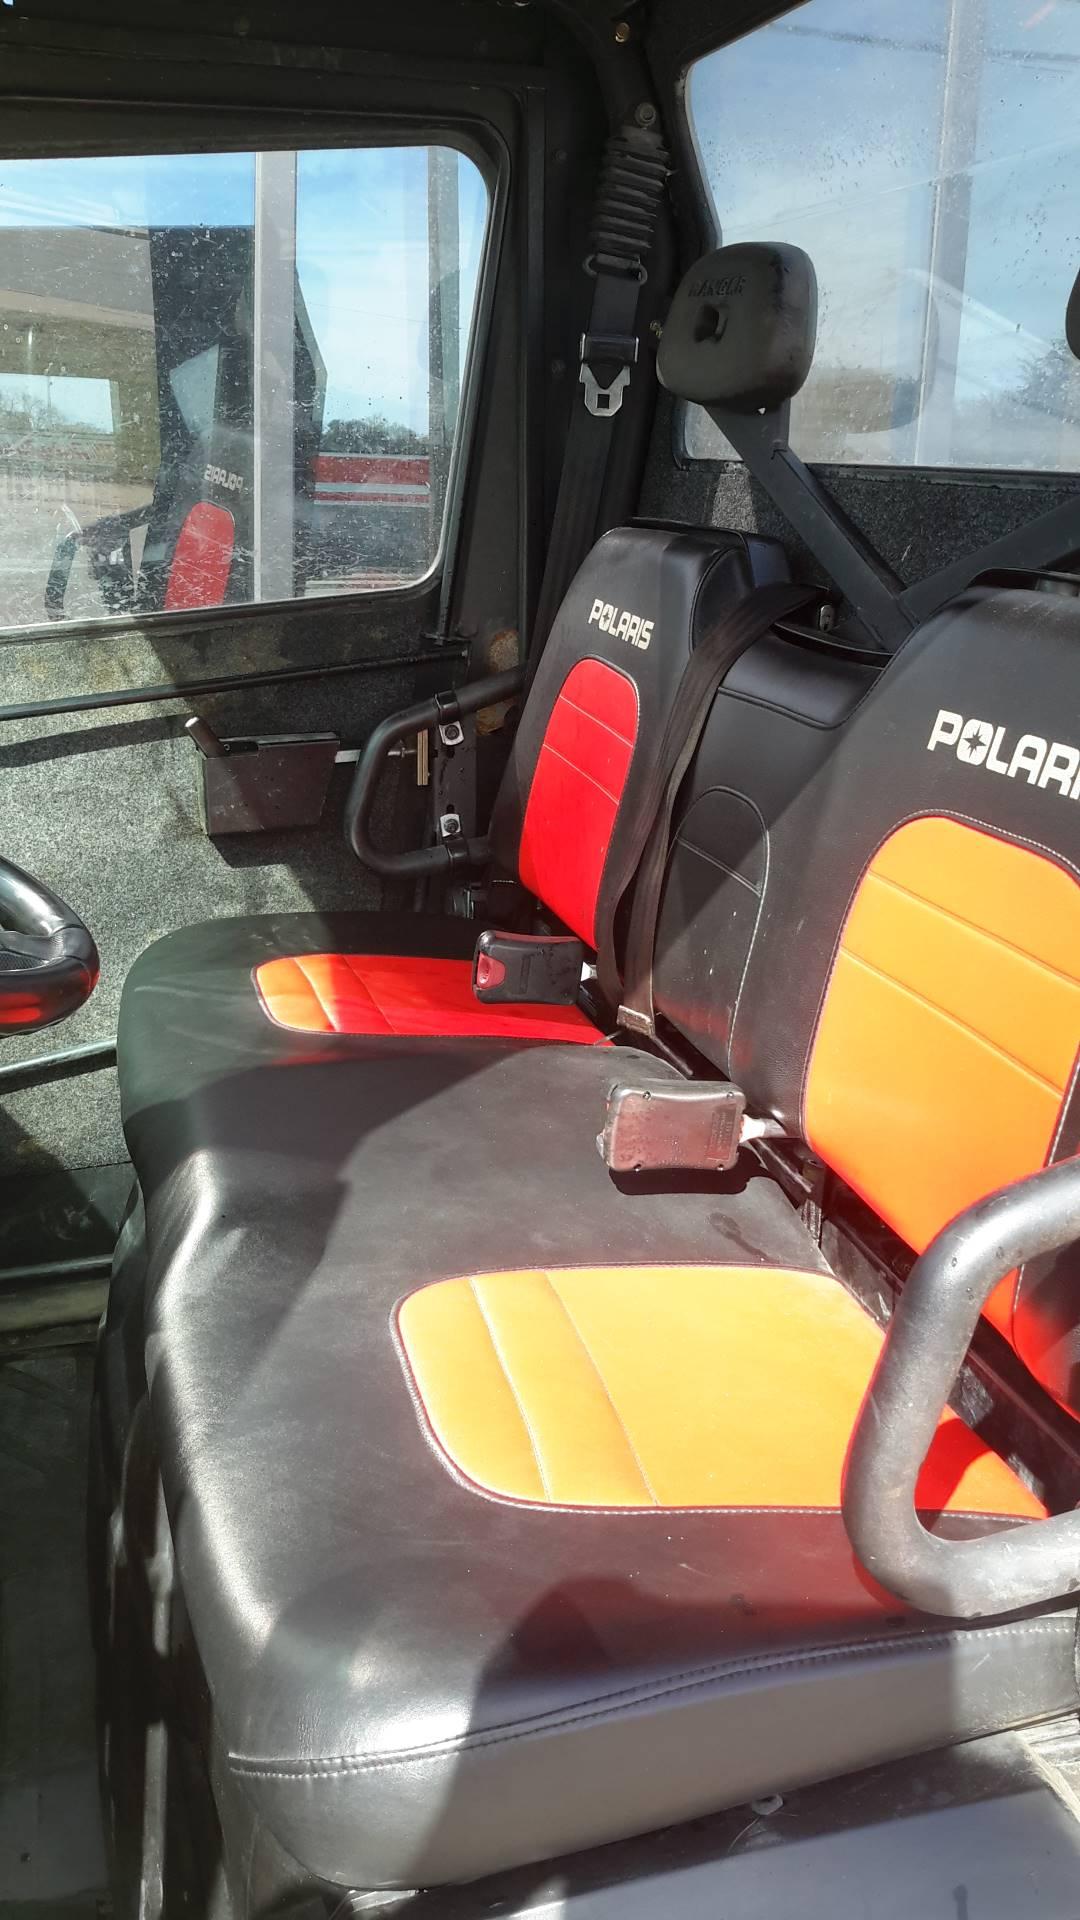 2011 Polaris Ranger XP 800 2